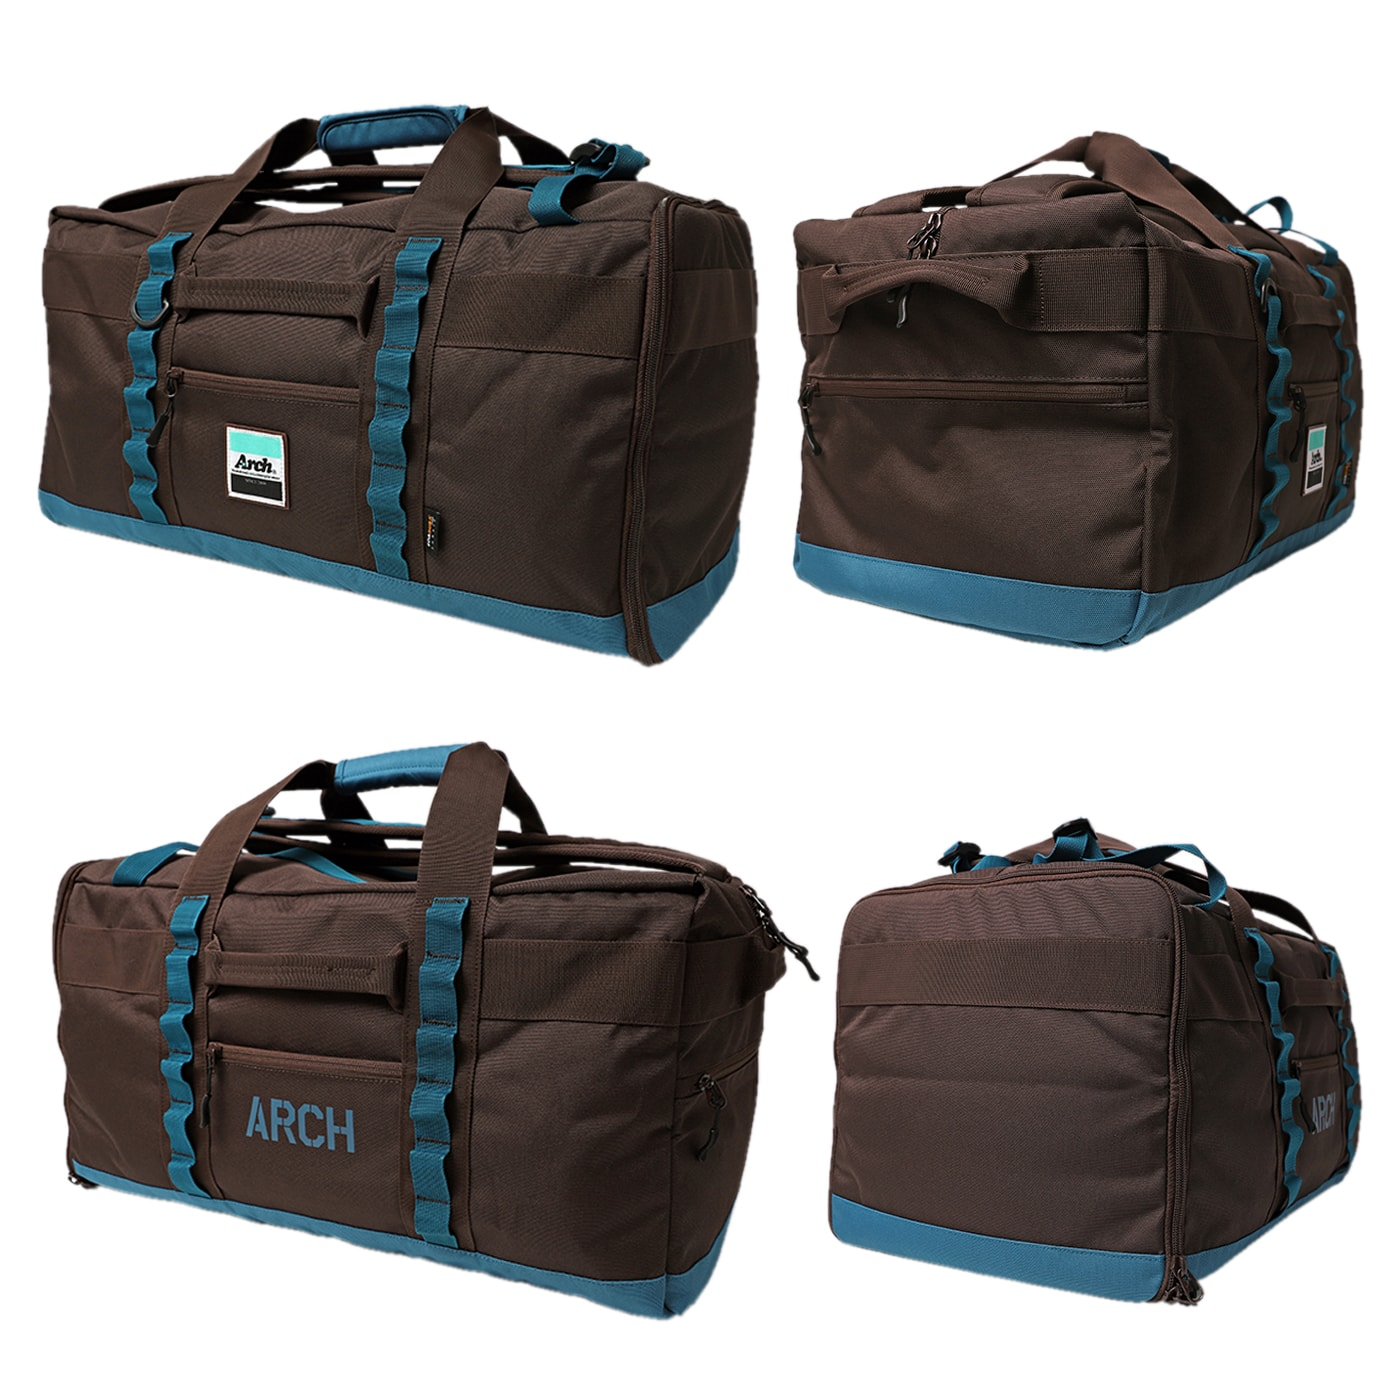 Arch tour duffel bag